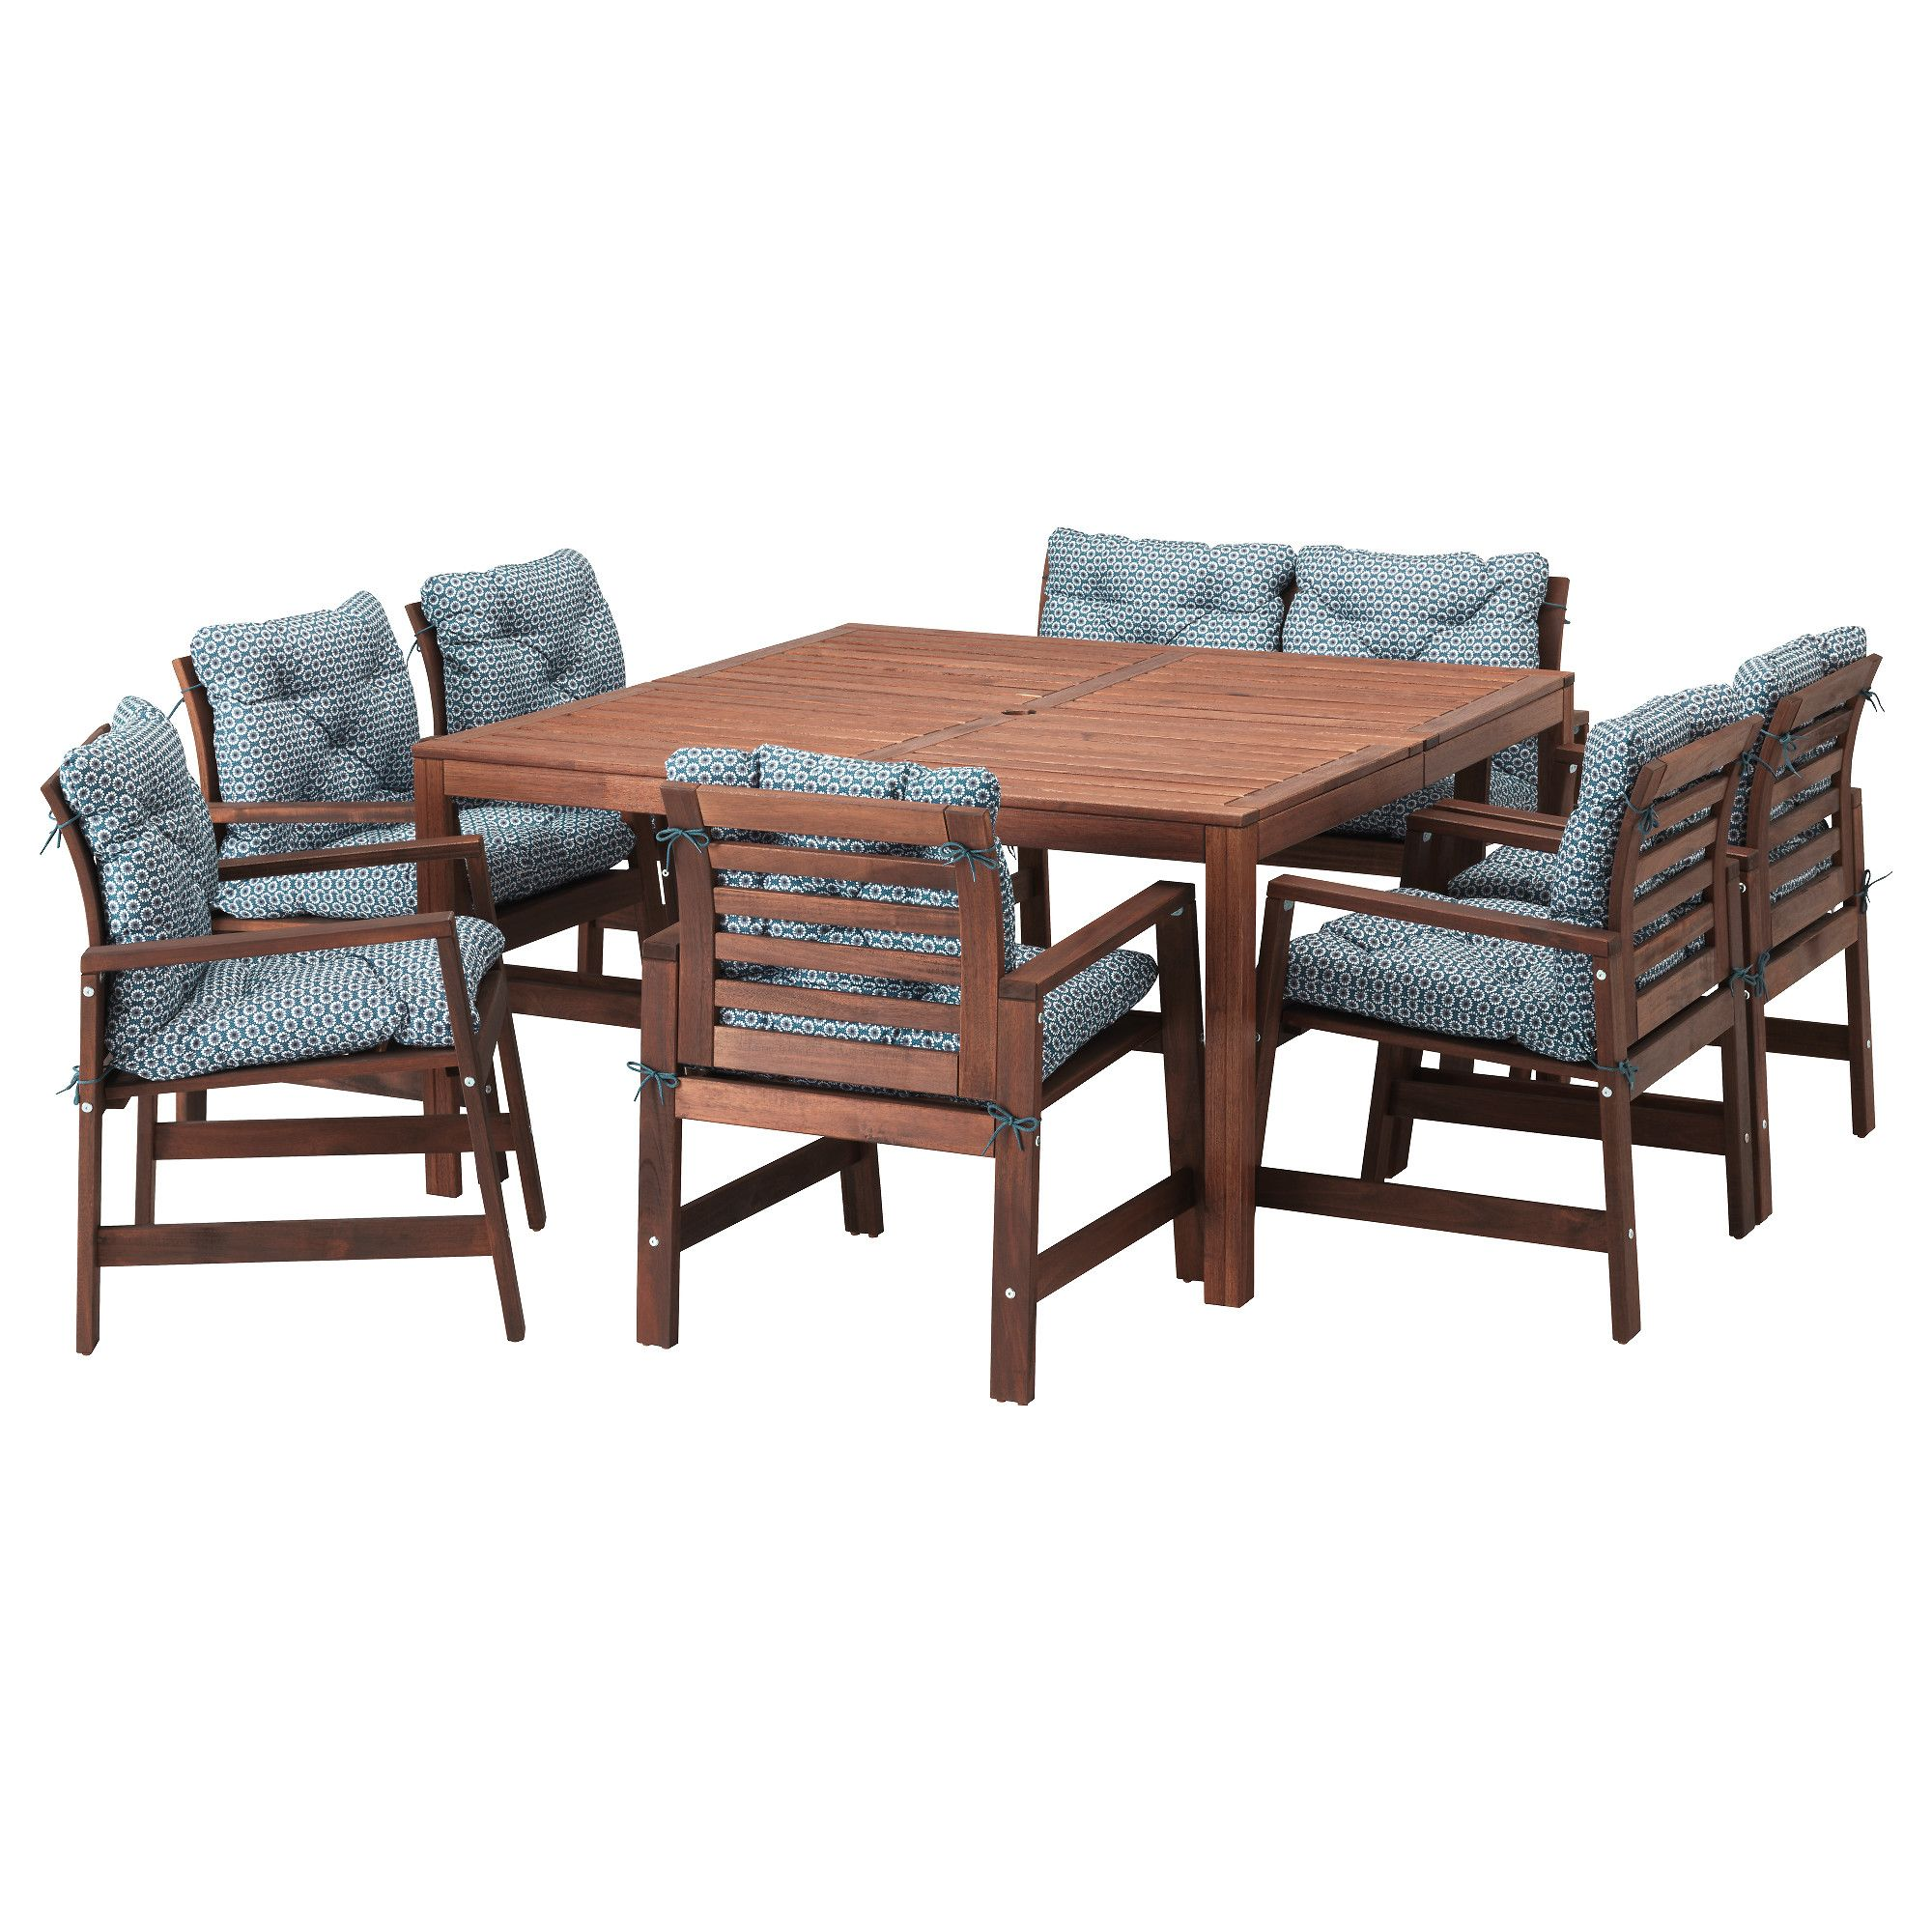 mr gardener gartenhaus newport my blog. Black Bedroom Furniture Sets. Home Design Ideas